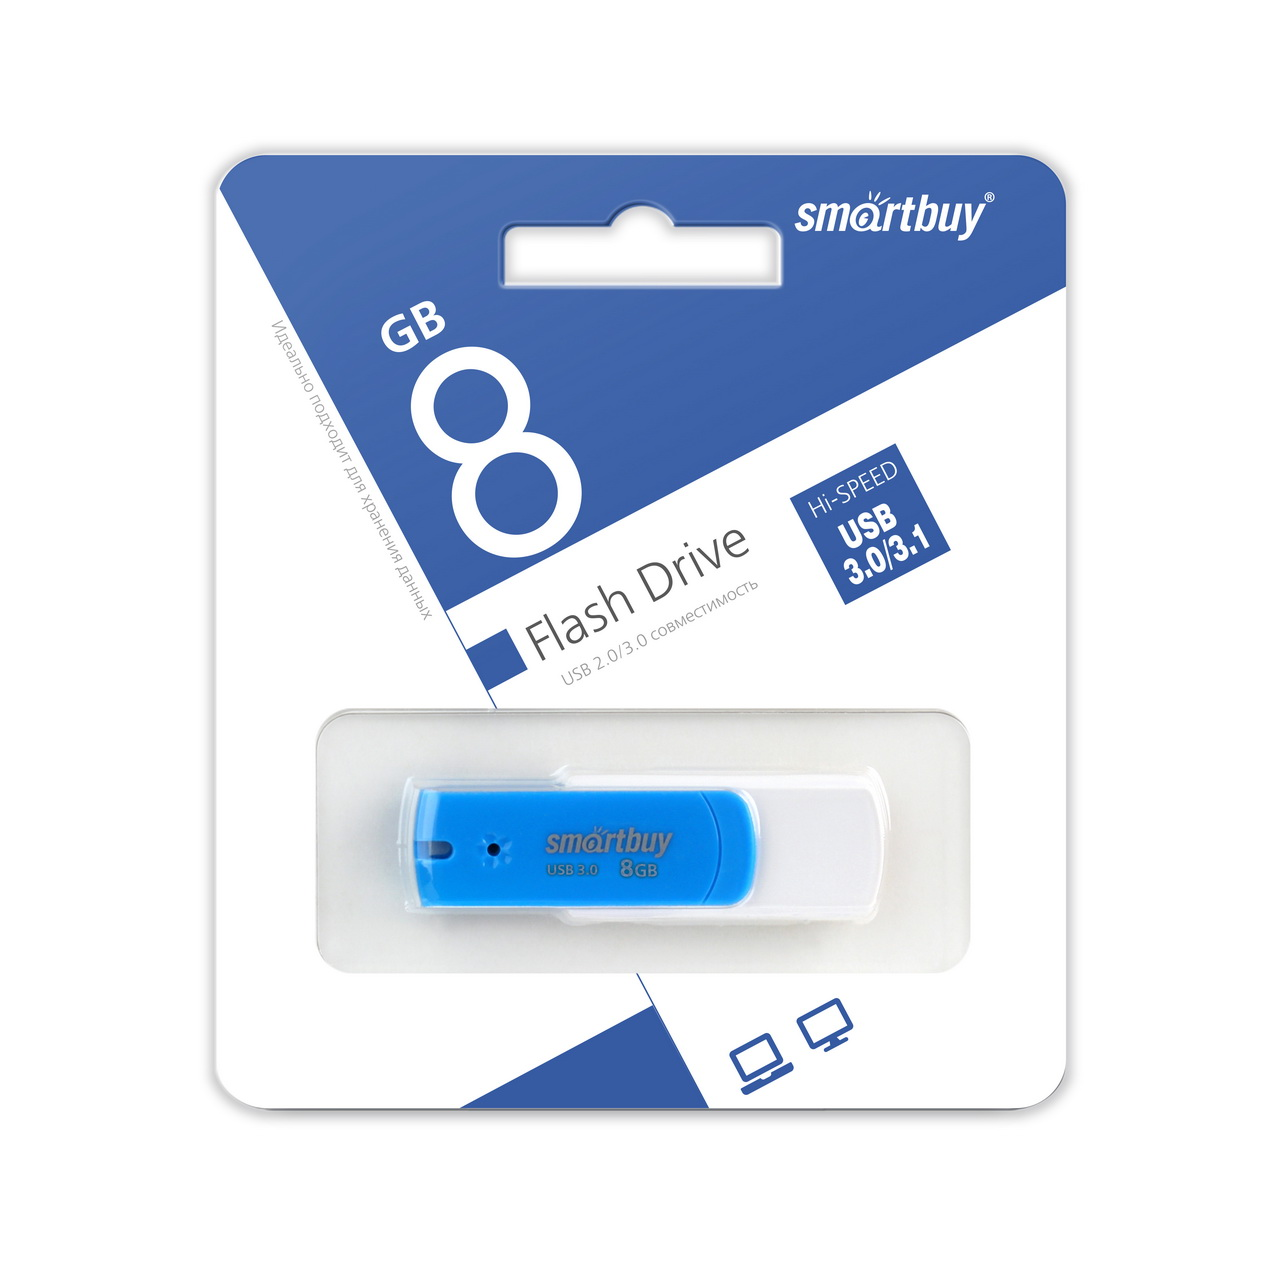 USB 3.0 флэш-диск Smartbuy Diamond Blue 8Gb оптом